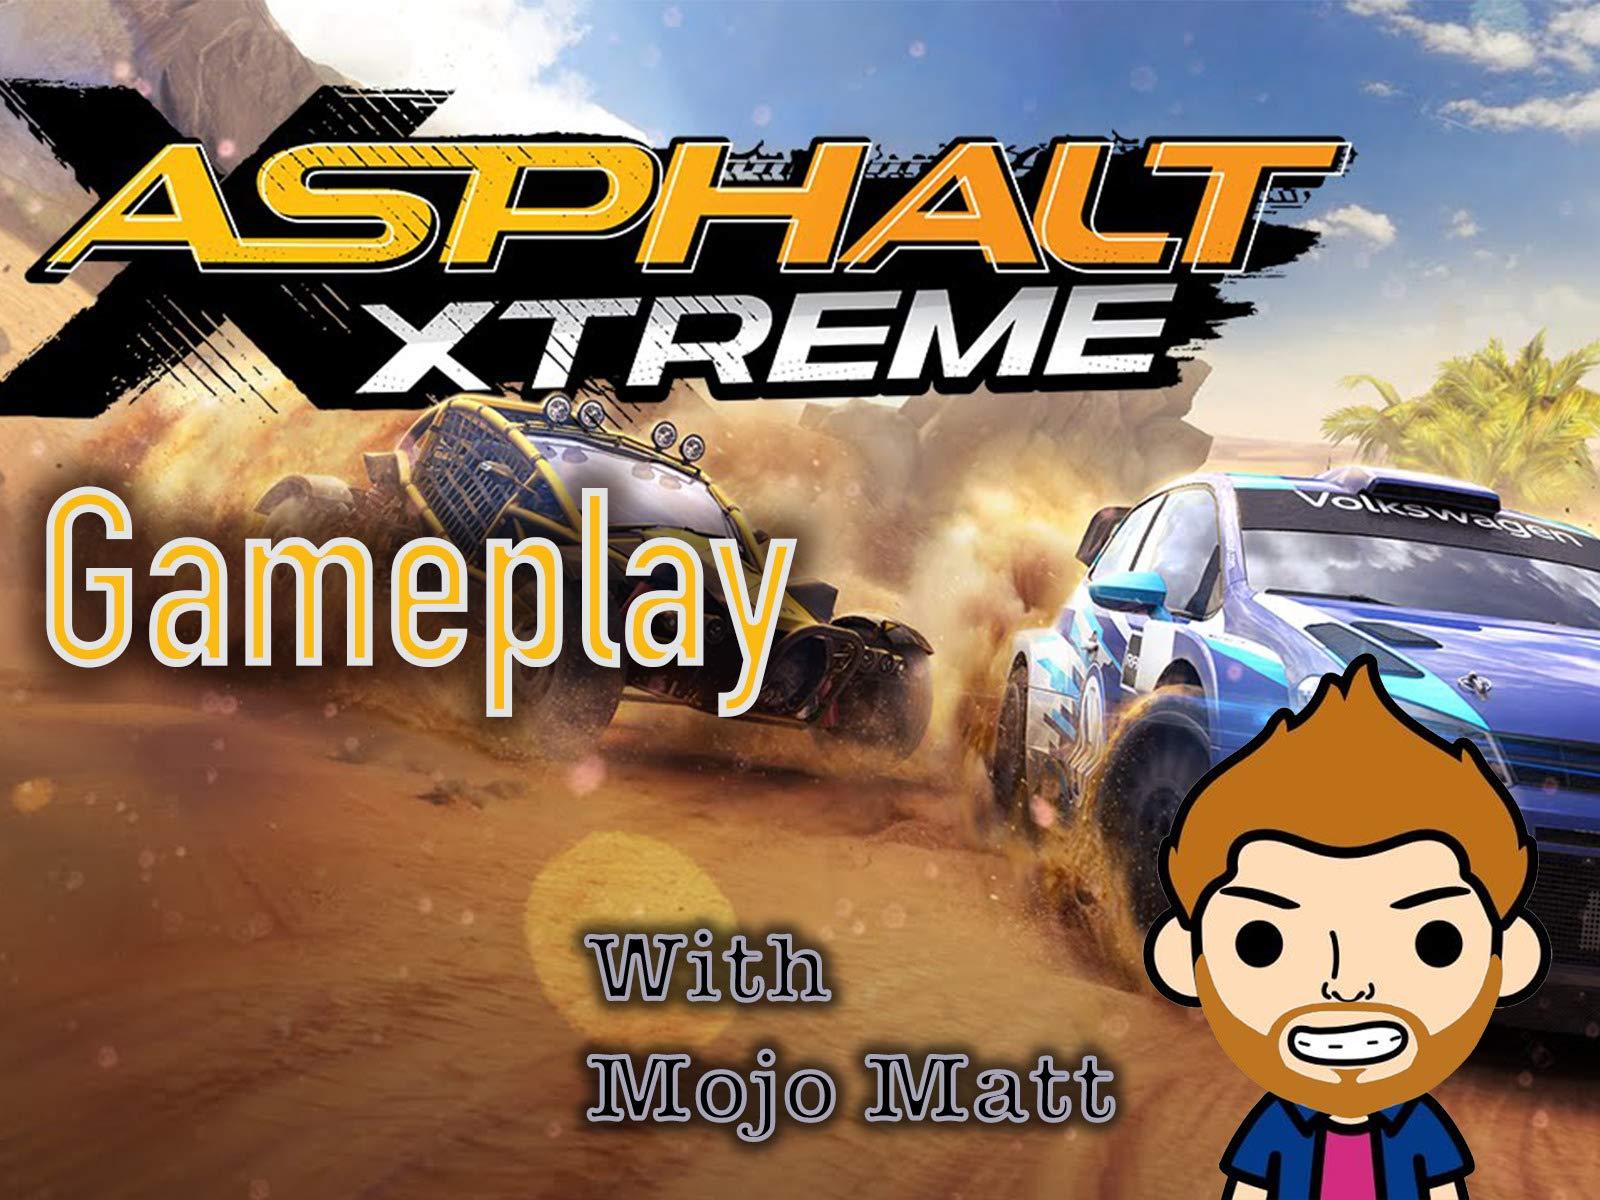 Asphalt Xtreme Gameplay With Mojo Matt - Season 1